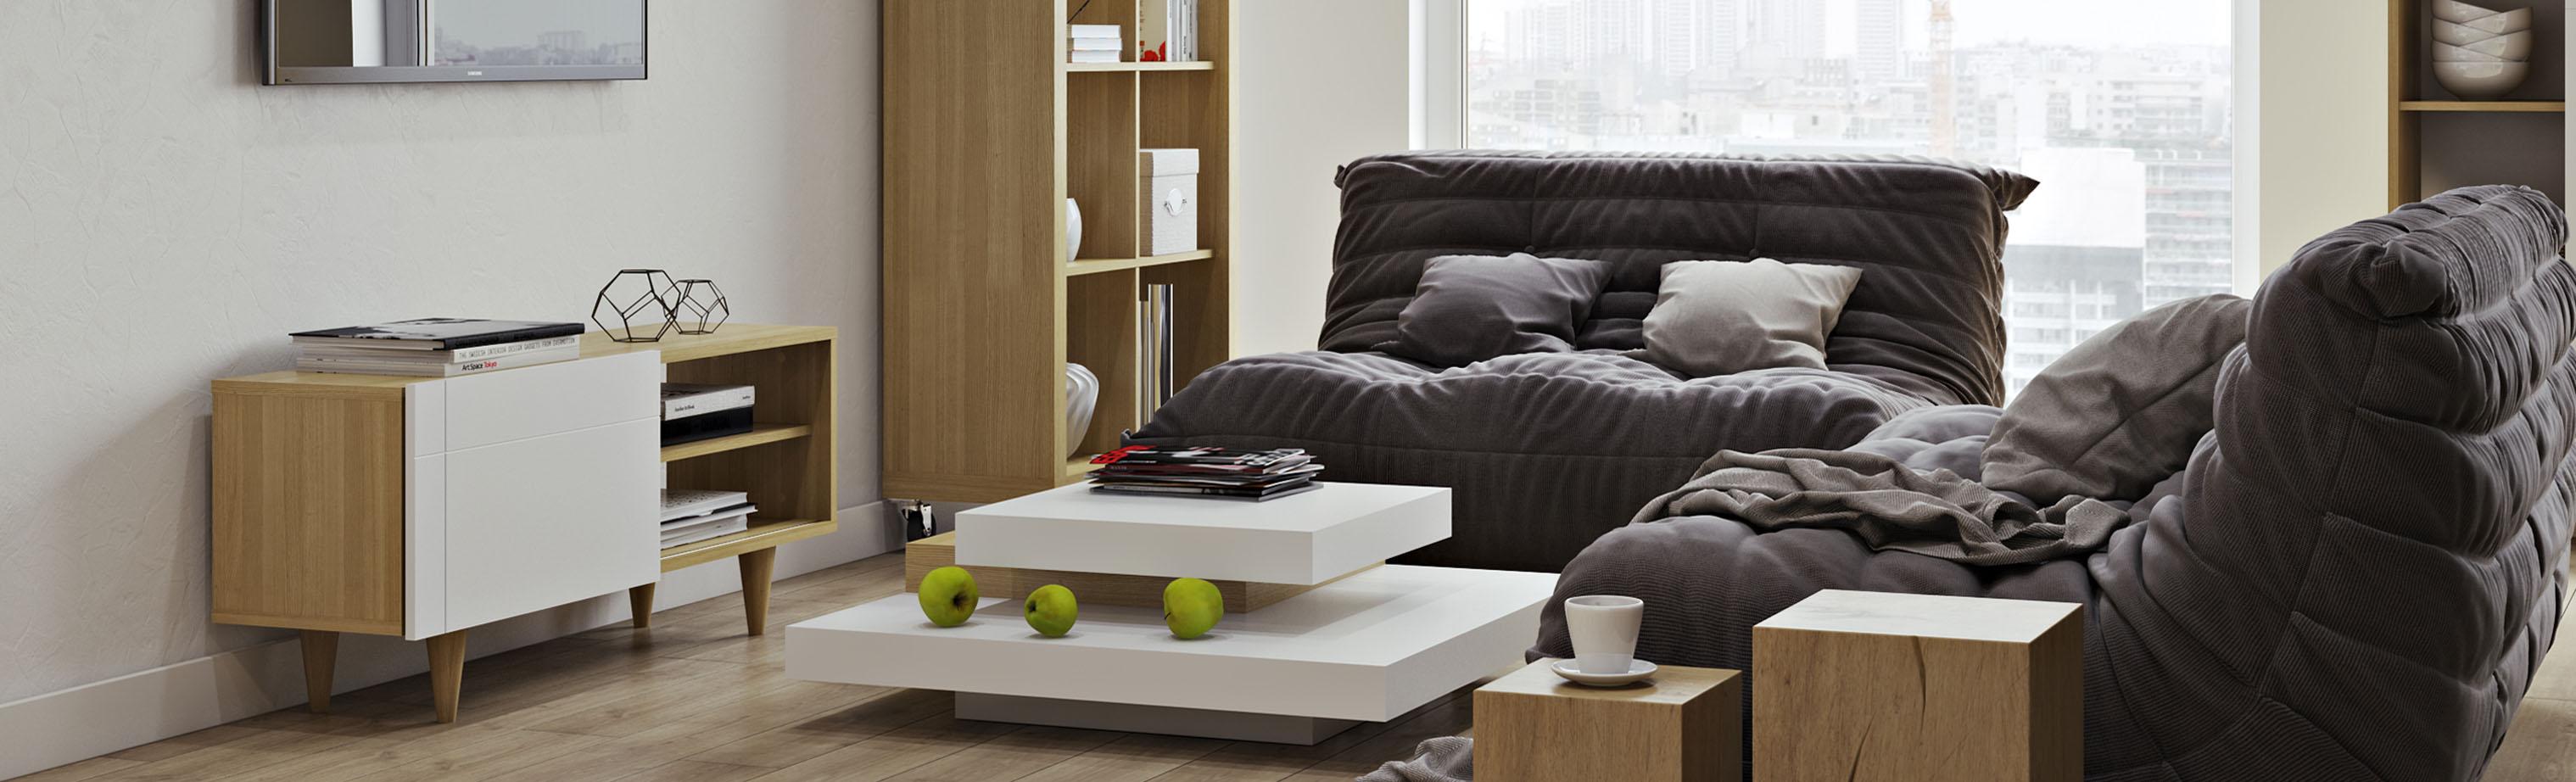 Meuble Tv Grande Taille comment bien choisir son meuble tv ? | camif